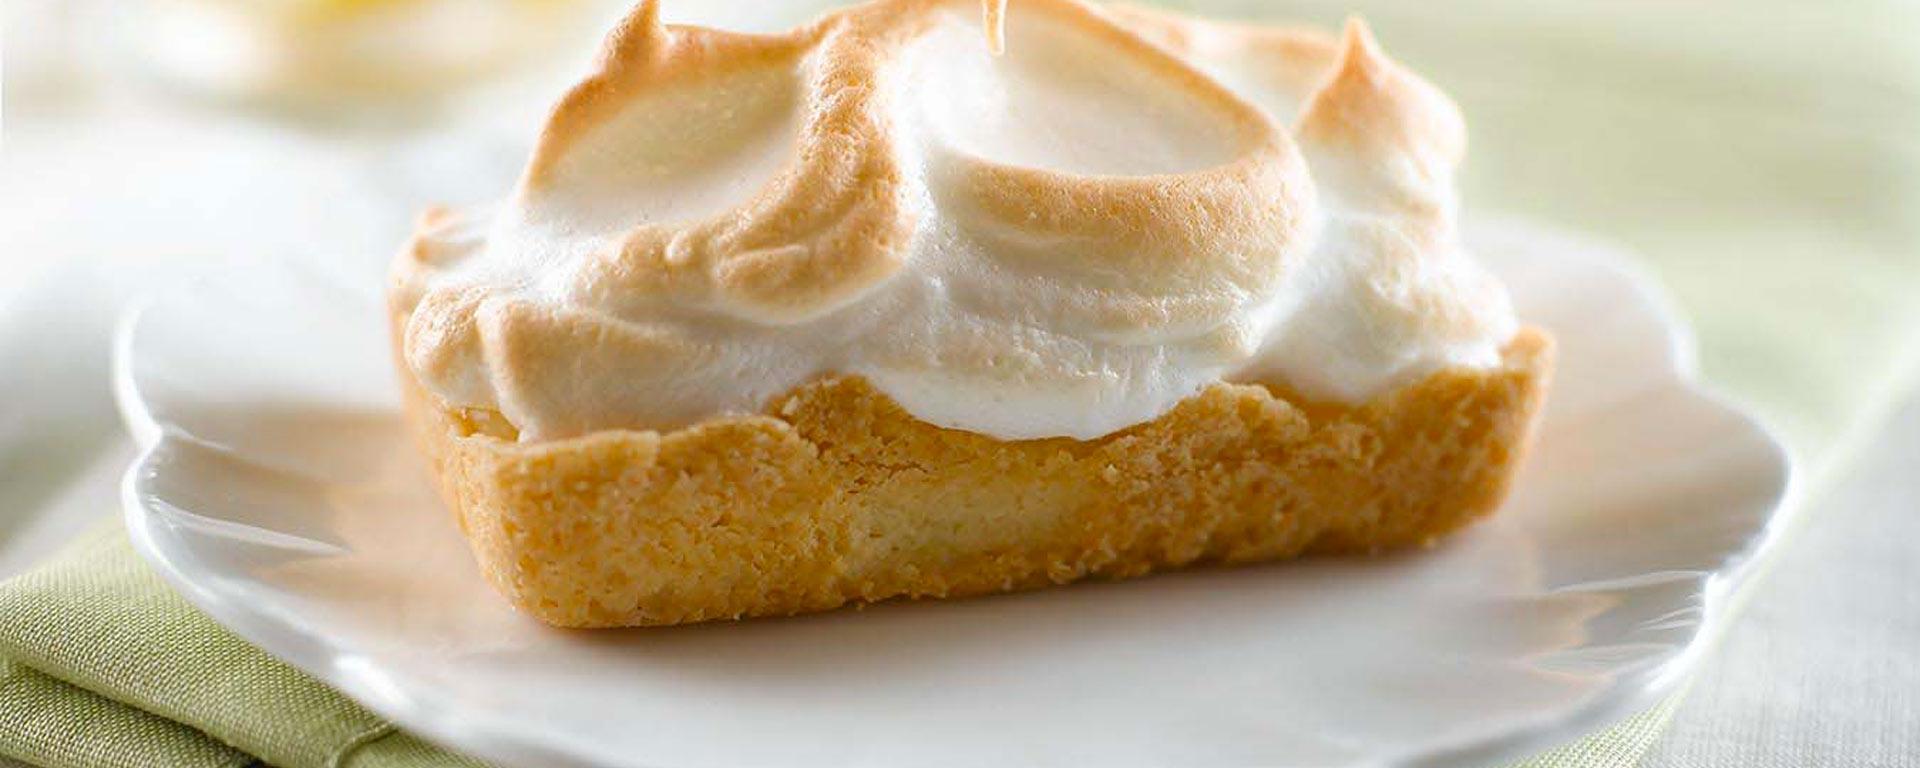 Photo for - Sour Cream Lemon Meringue Shortbread Tarts